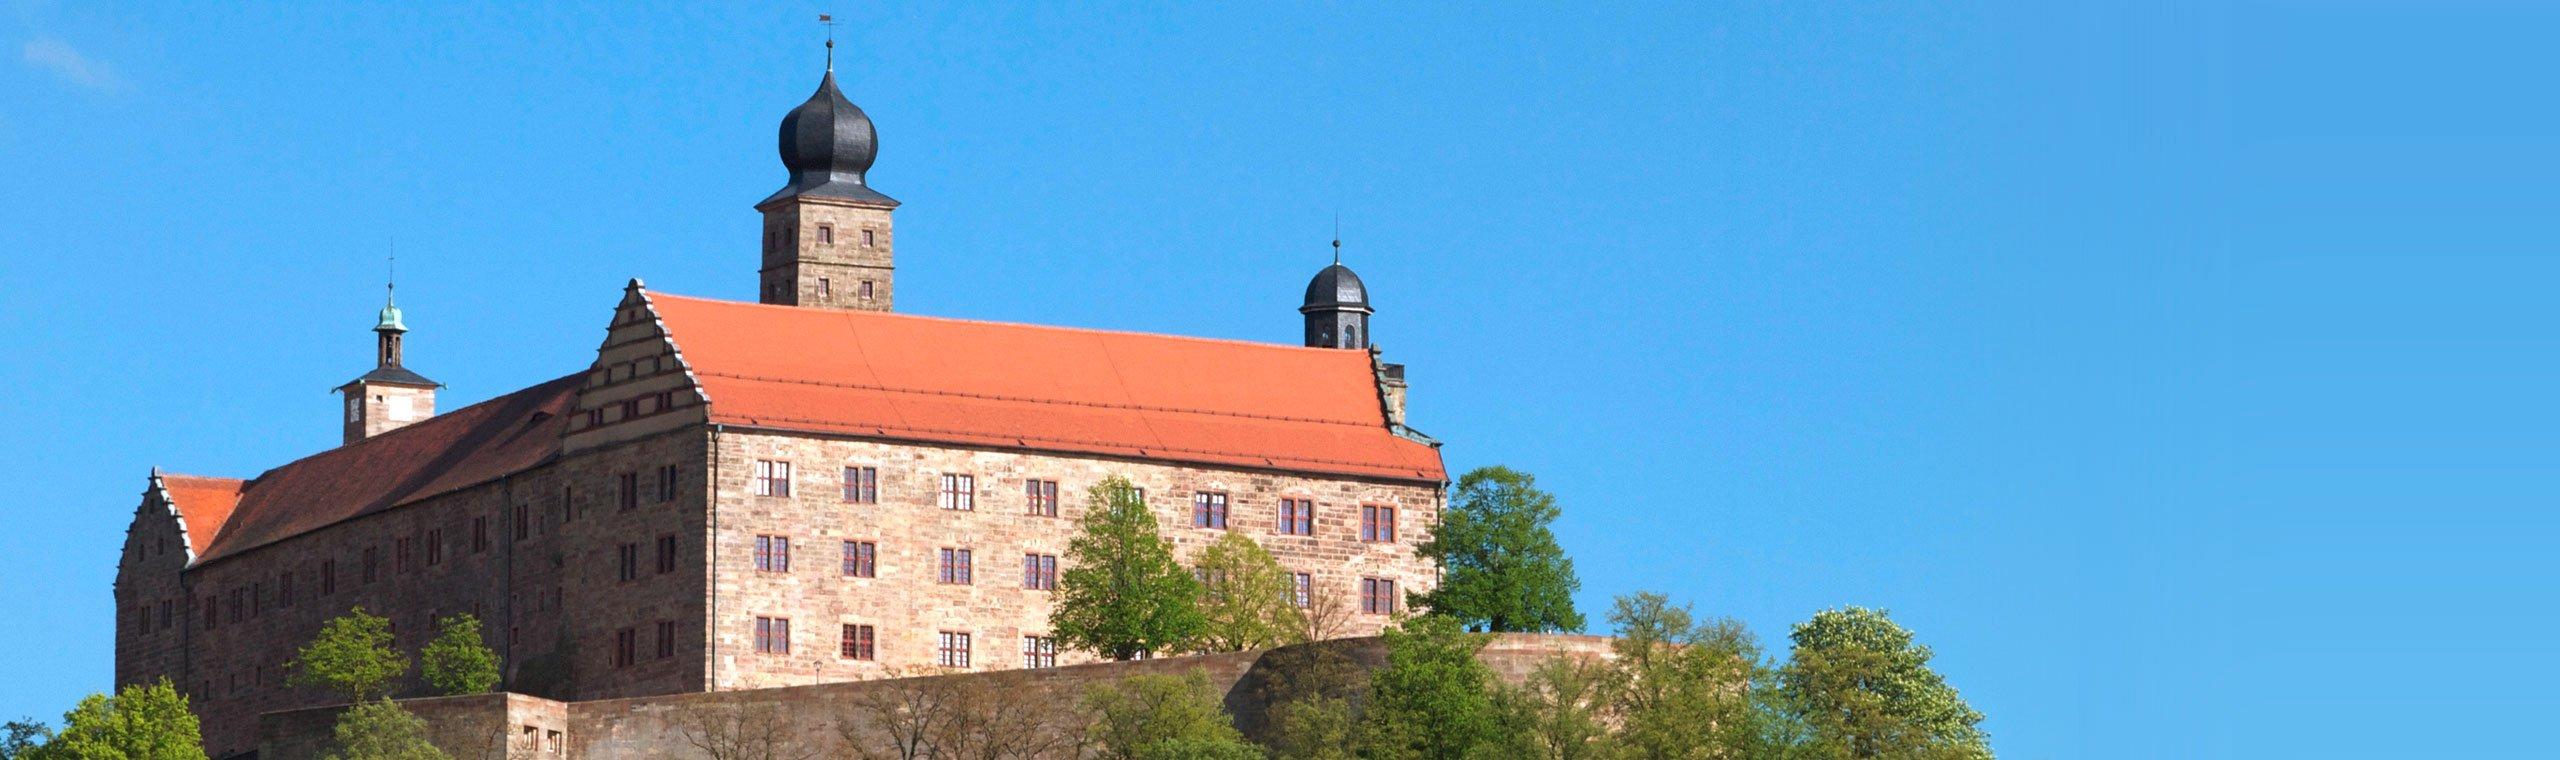 Die Plassenburg in Kulmbach